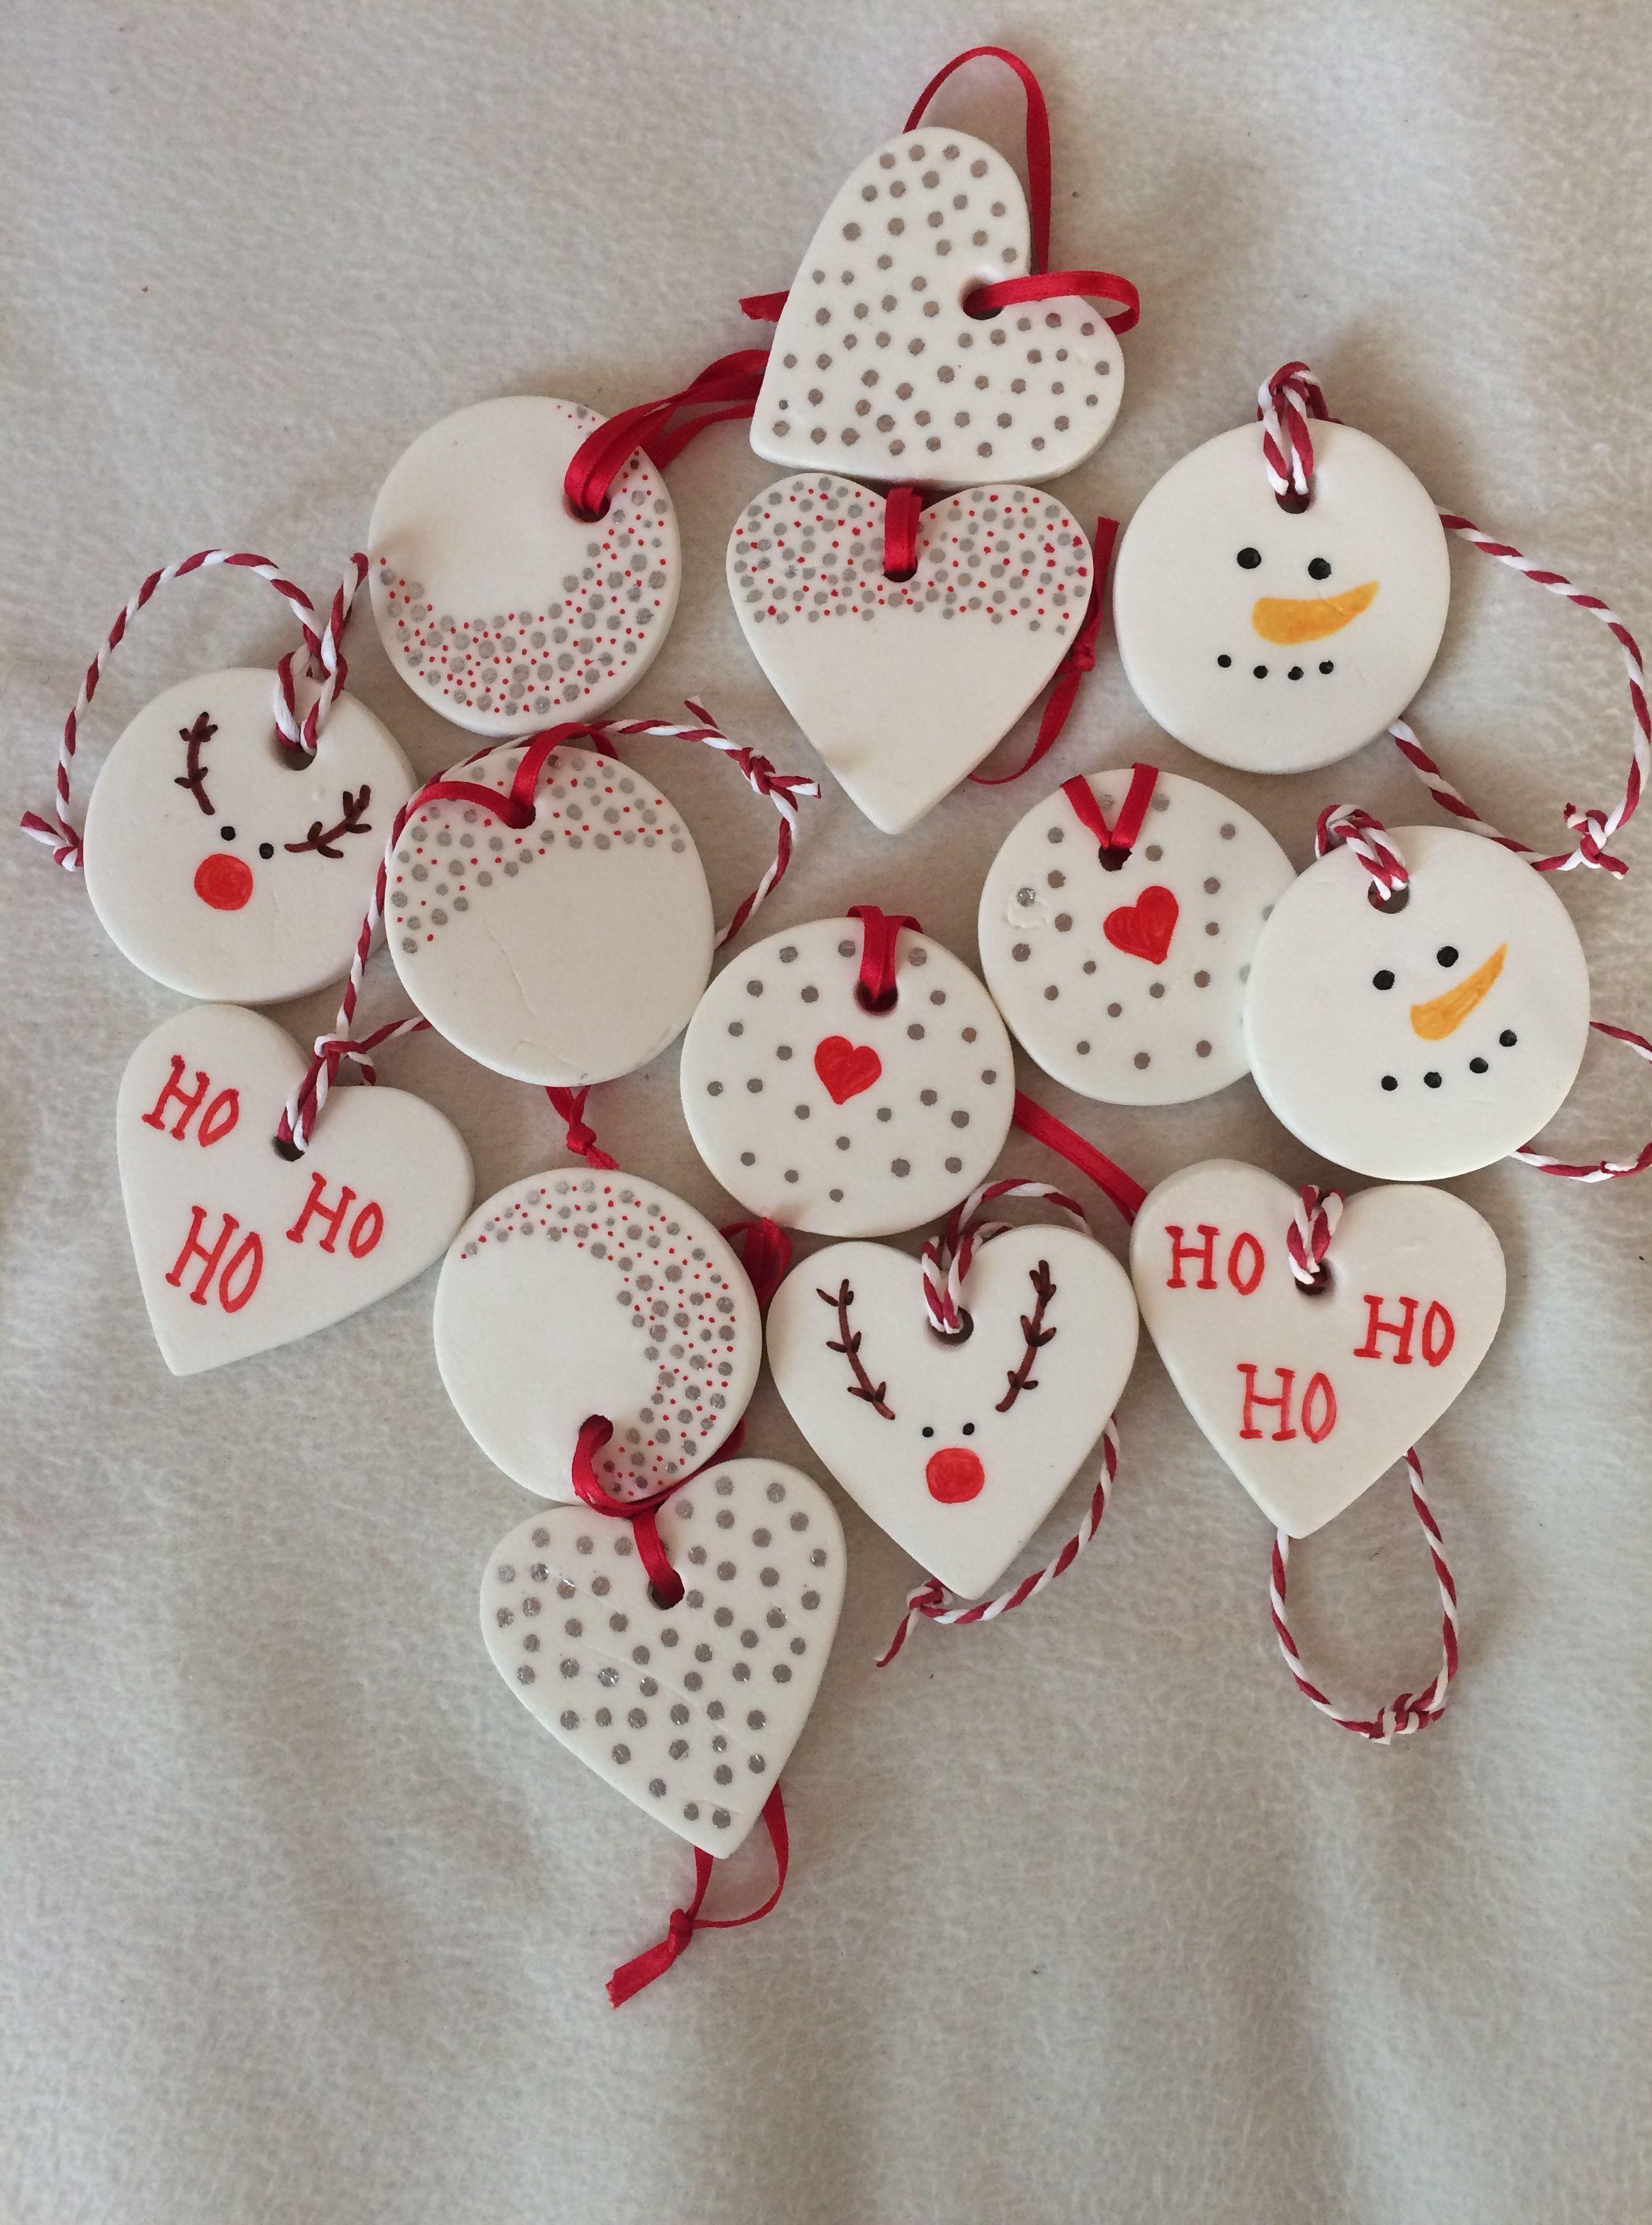 Decorations In Modeling Clay Weihnachtsgeschenkeselbermachen Baking Soda Christmas Clay Homemade Christmas Decorations Diy Christmas Ornaments